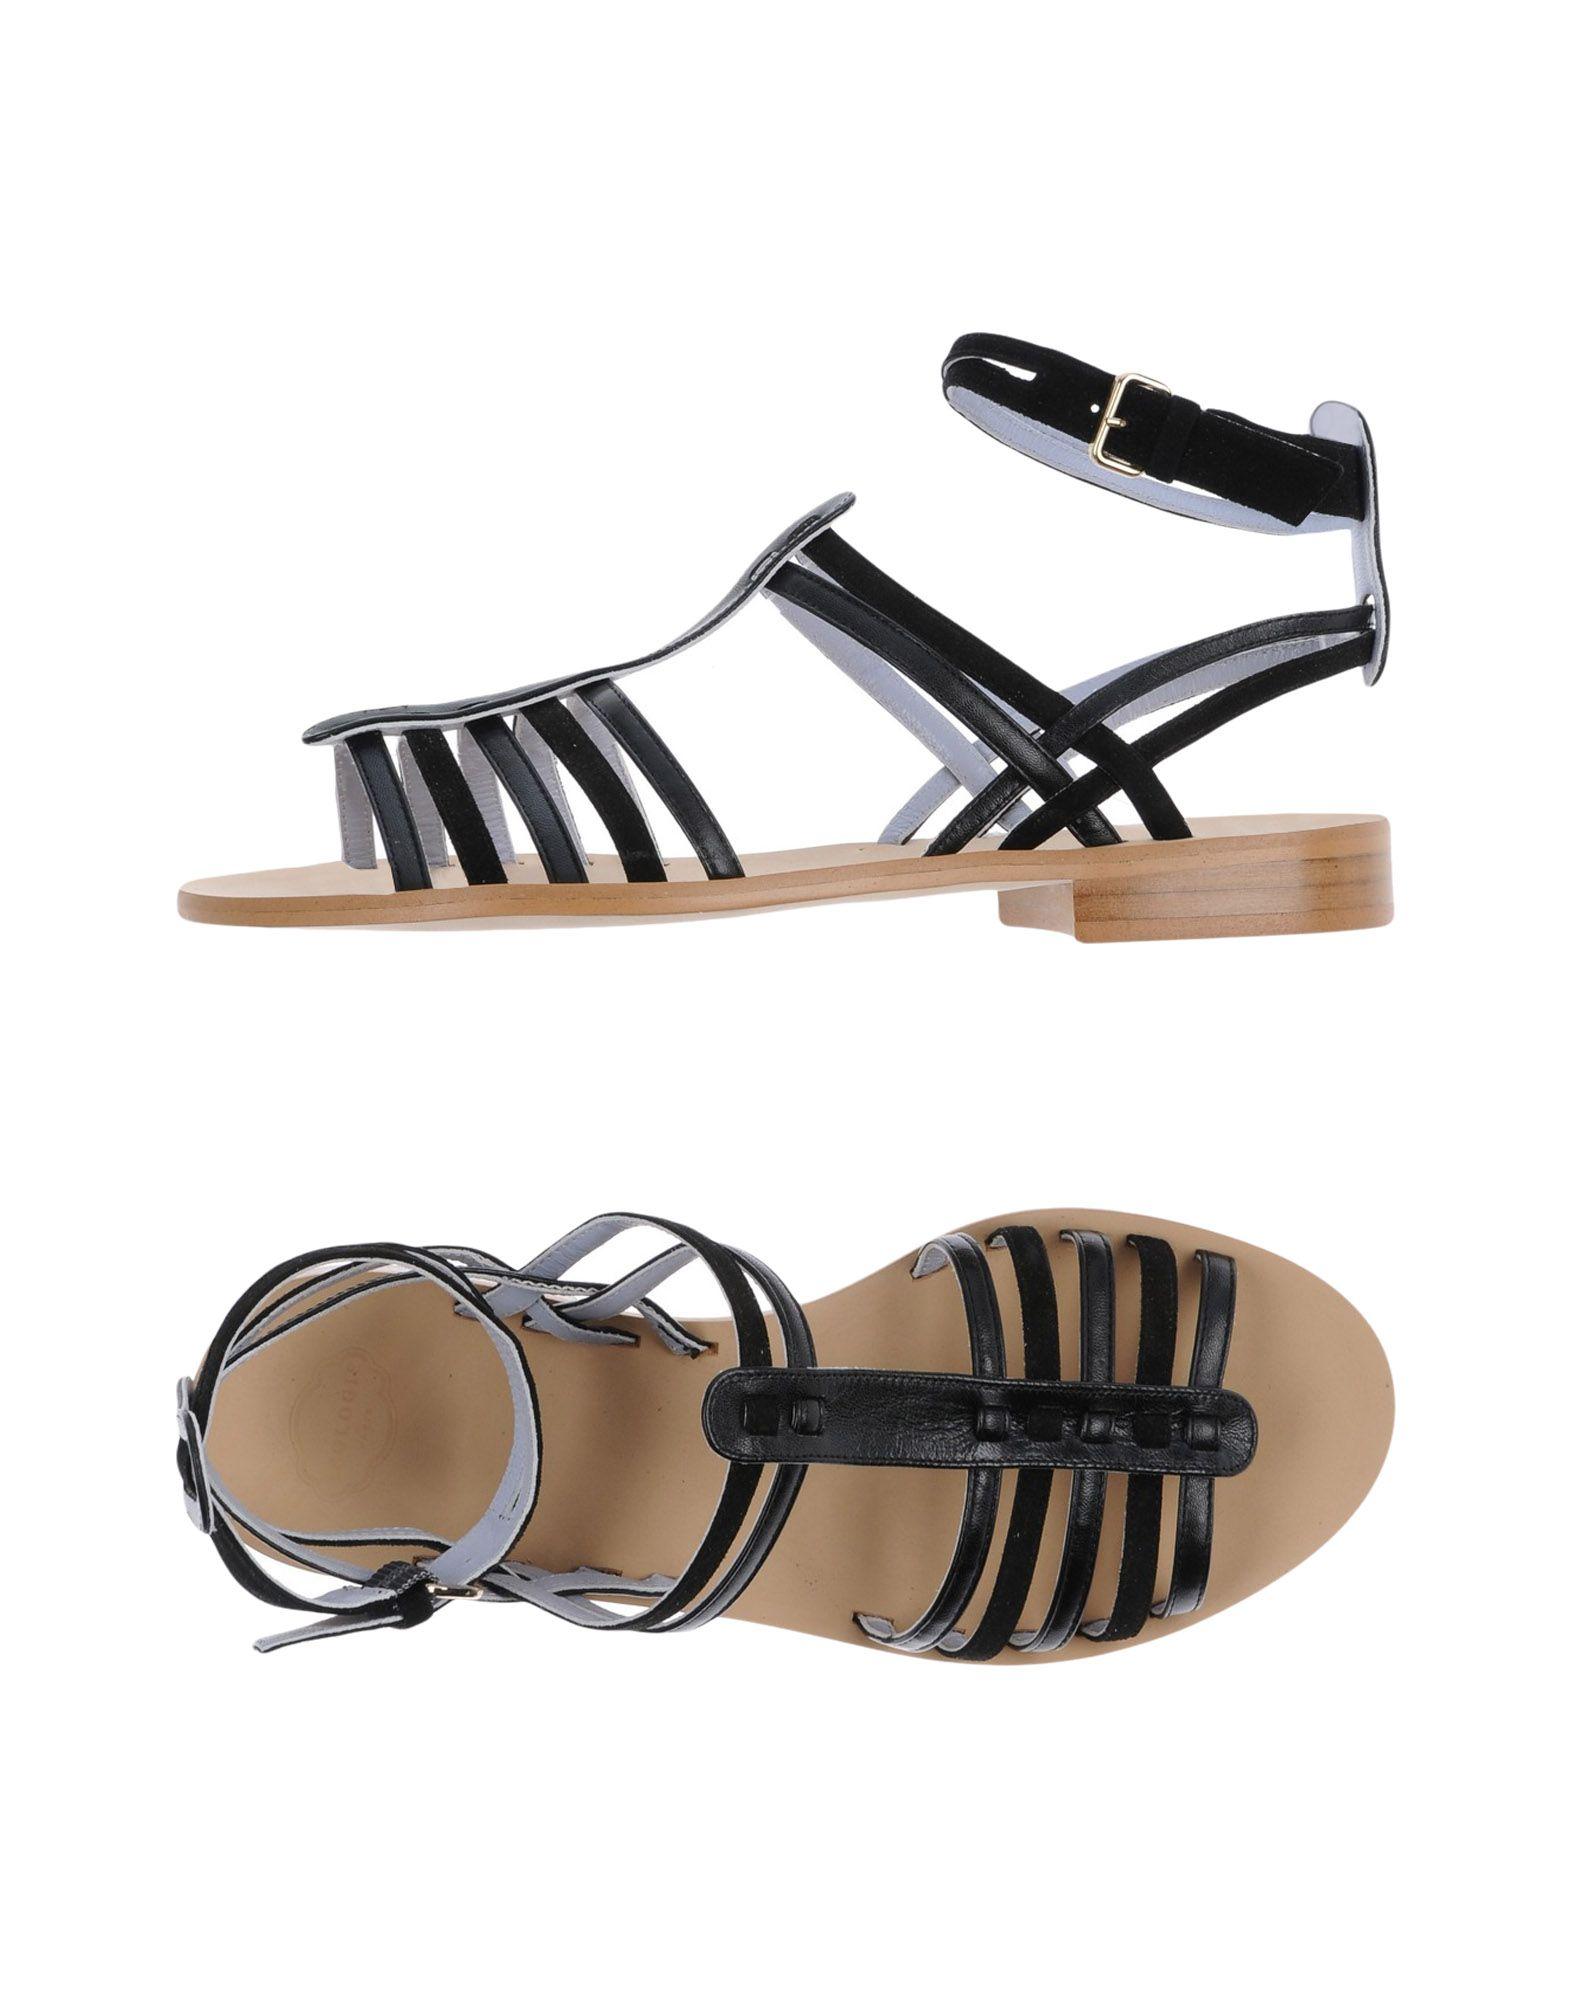 Apologie Sandalen Damen  11431560BB Gute Qualität beliebte Schuhe